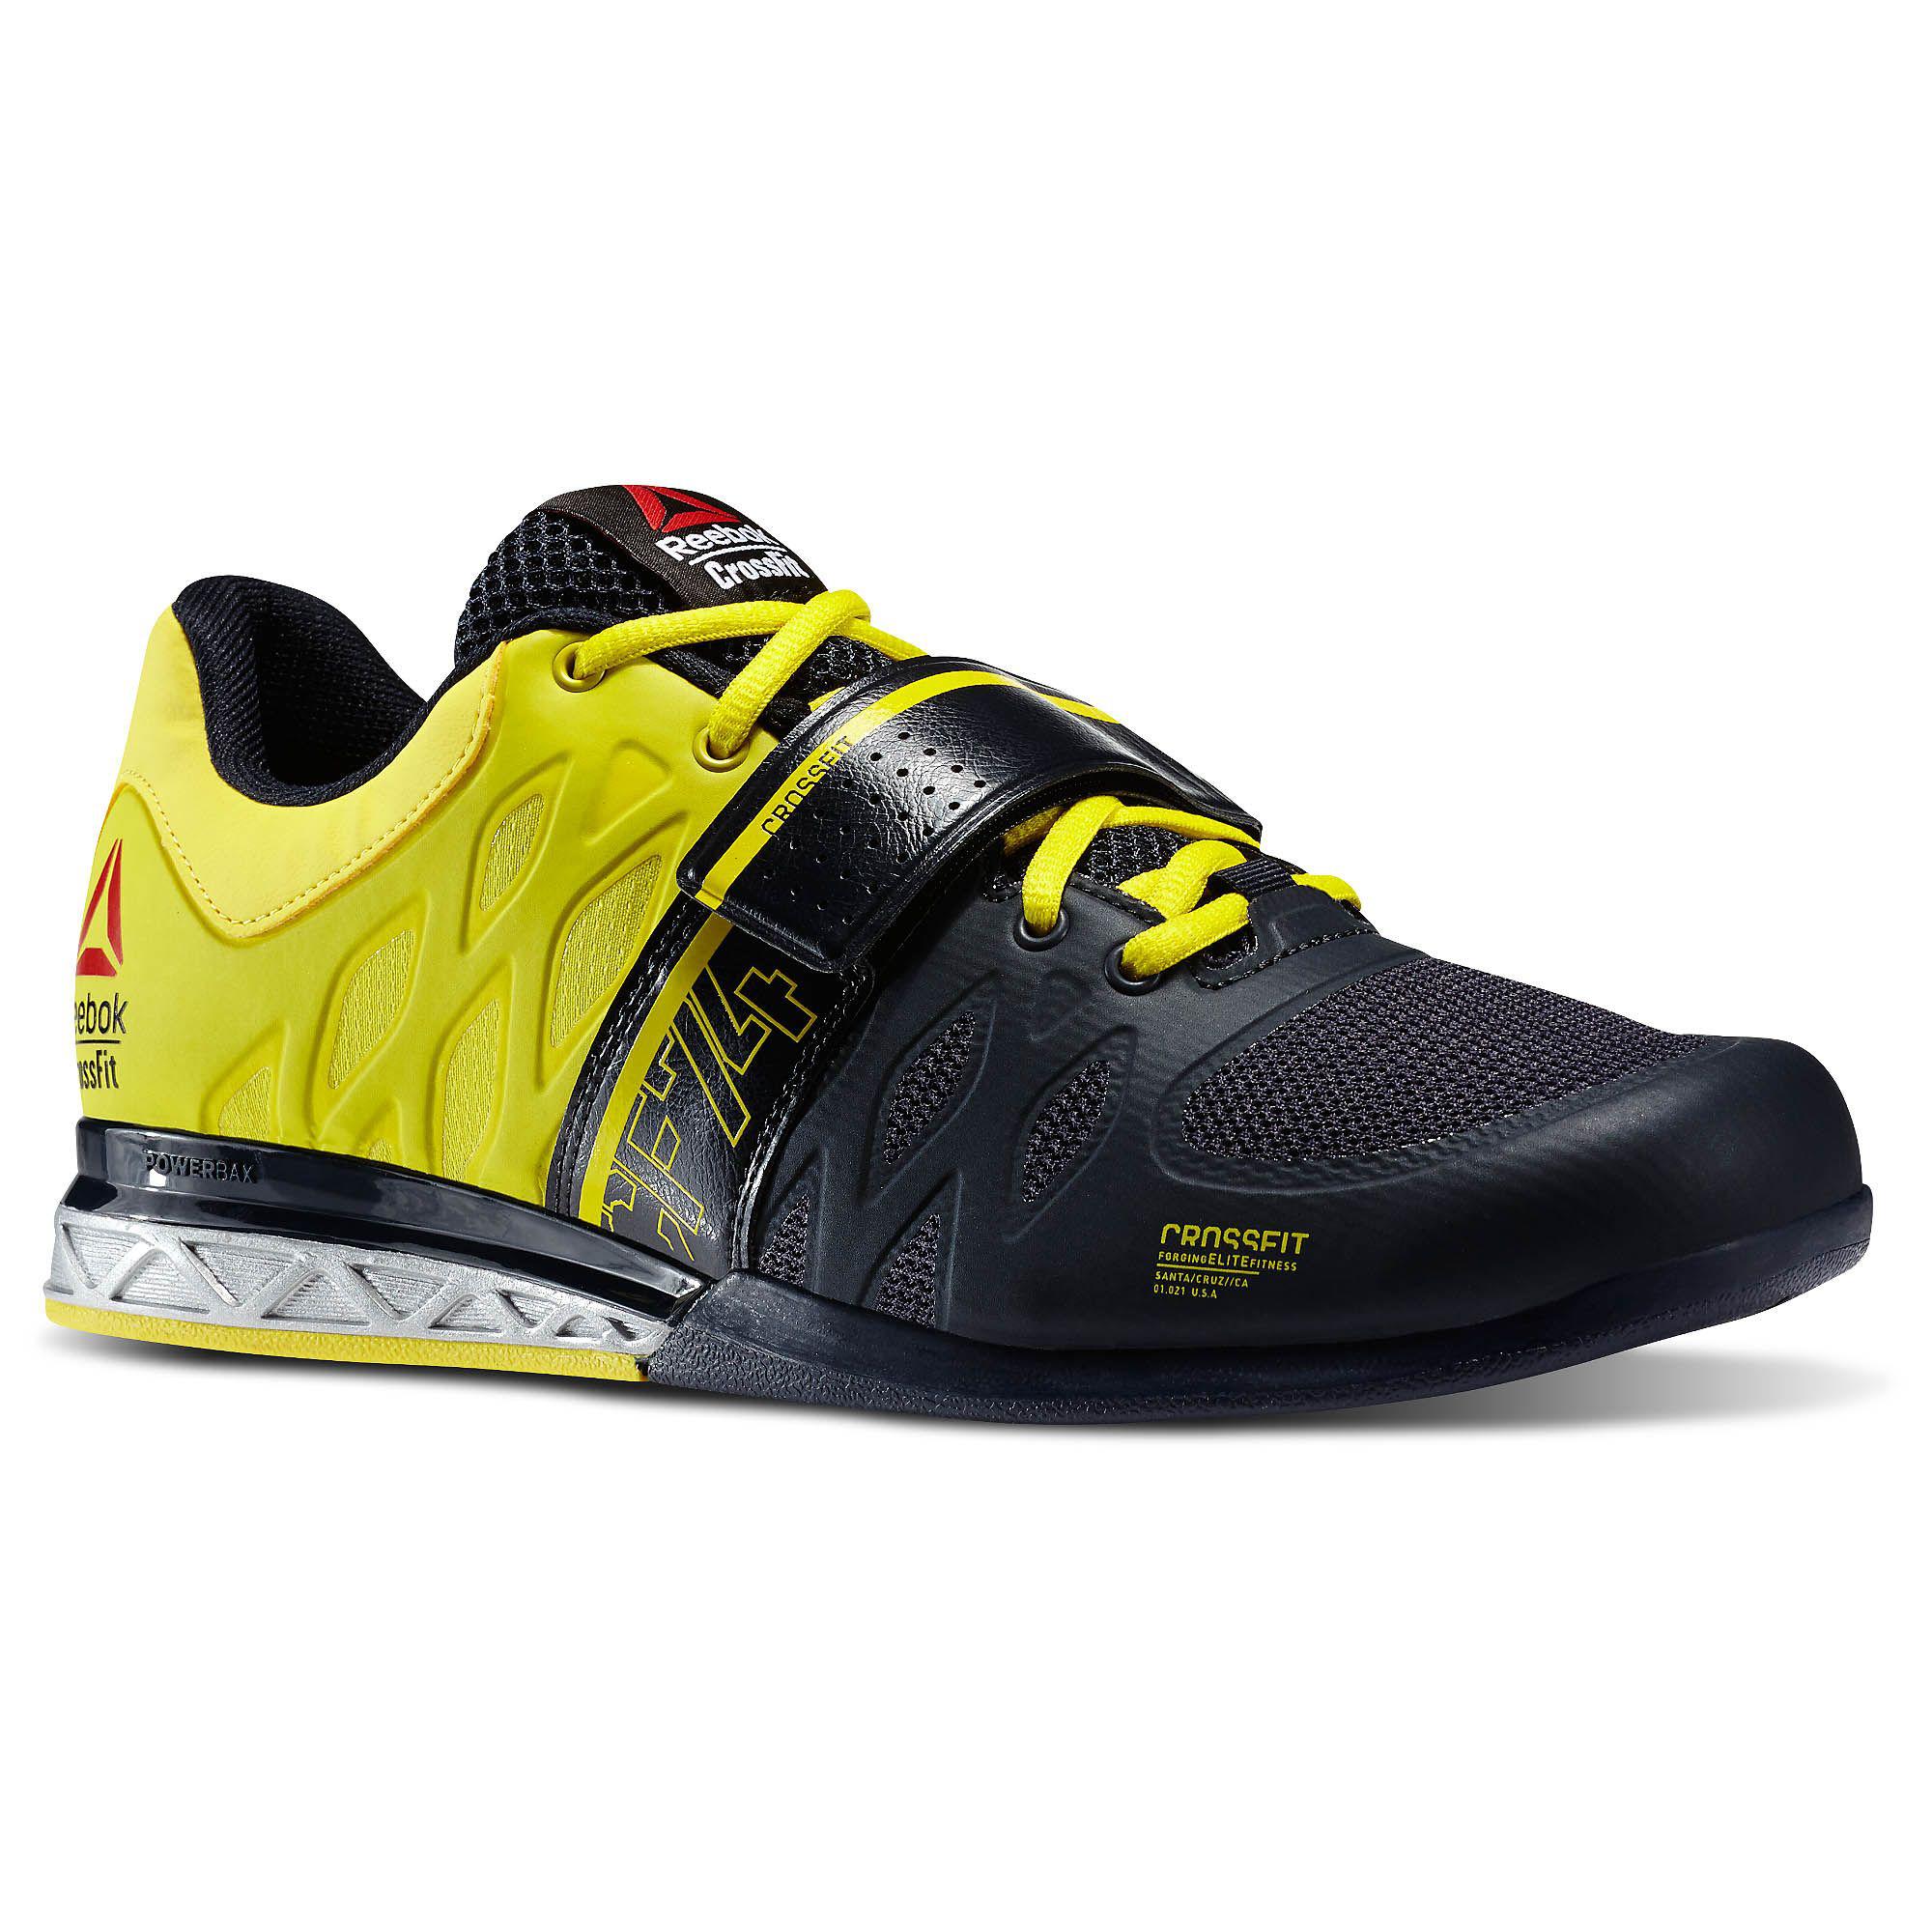 Chaussures Reebok Crossfit Lifter 2.0